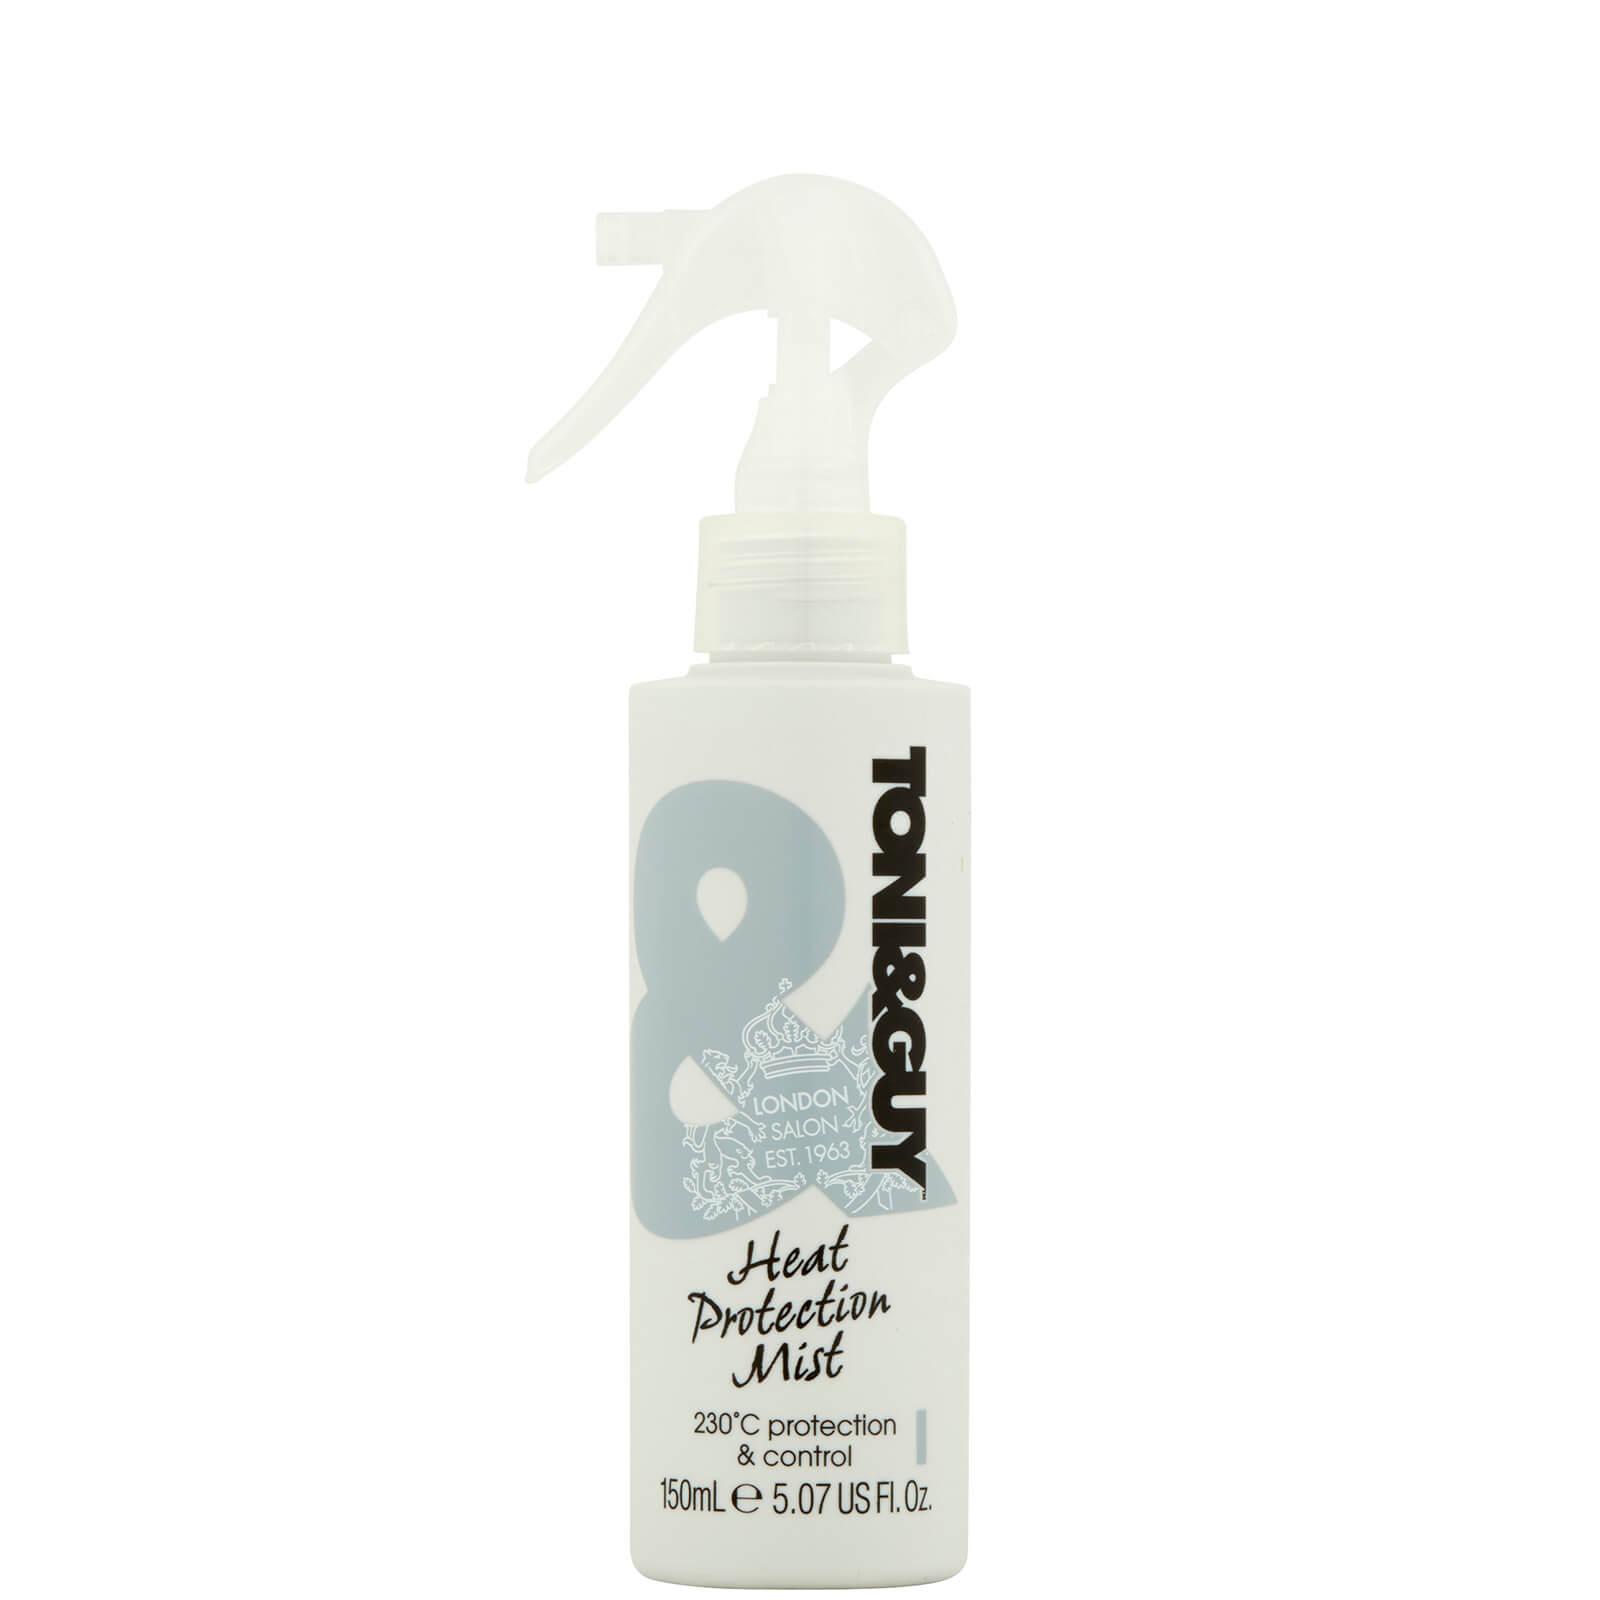 Купить Toni&Guy Prep Heat Protection Mist (150ml)